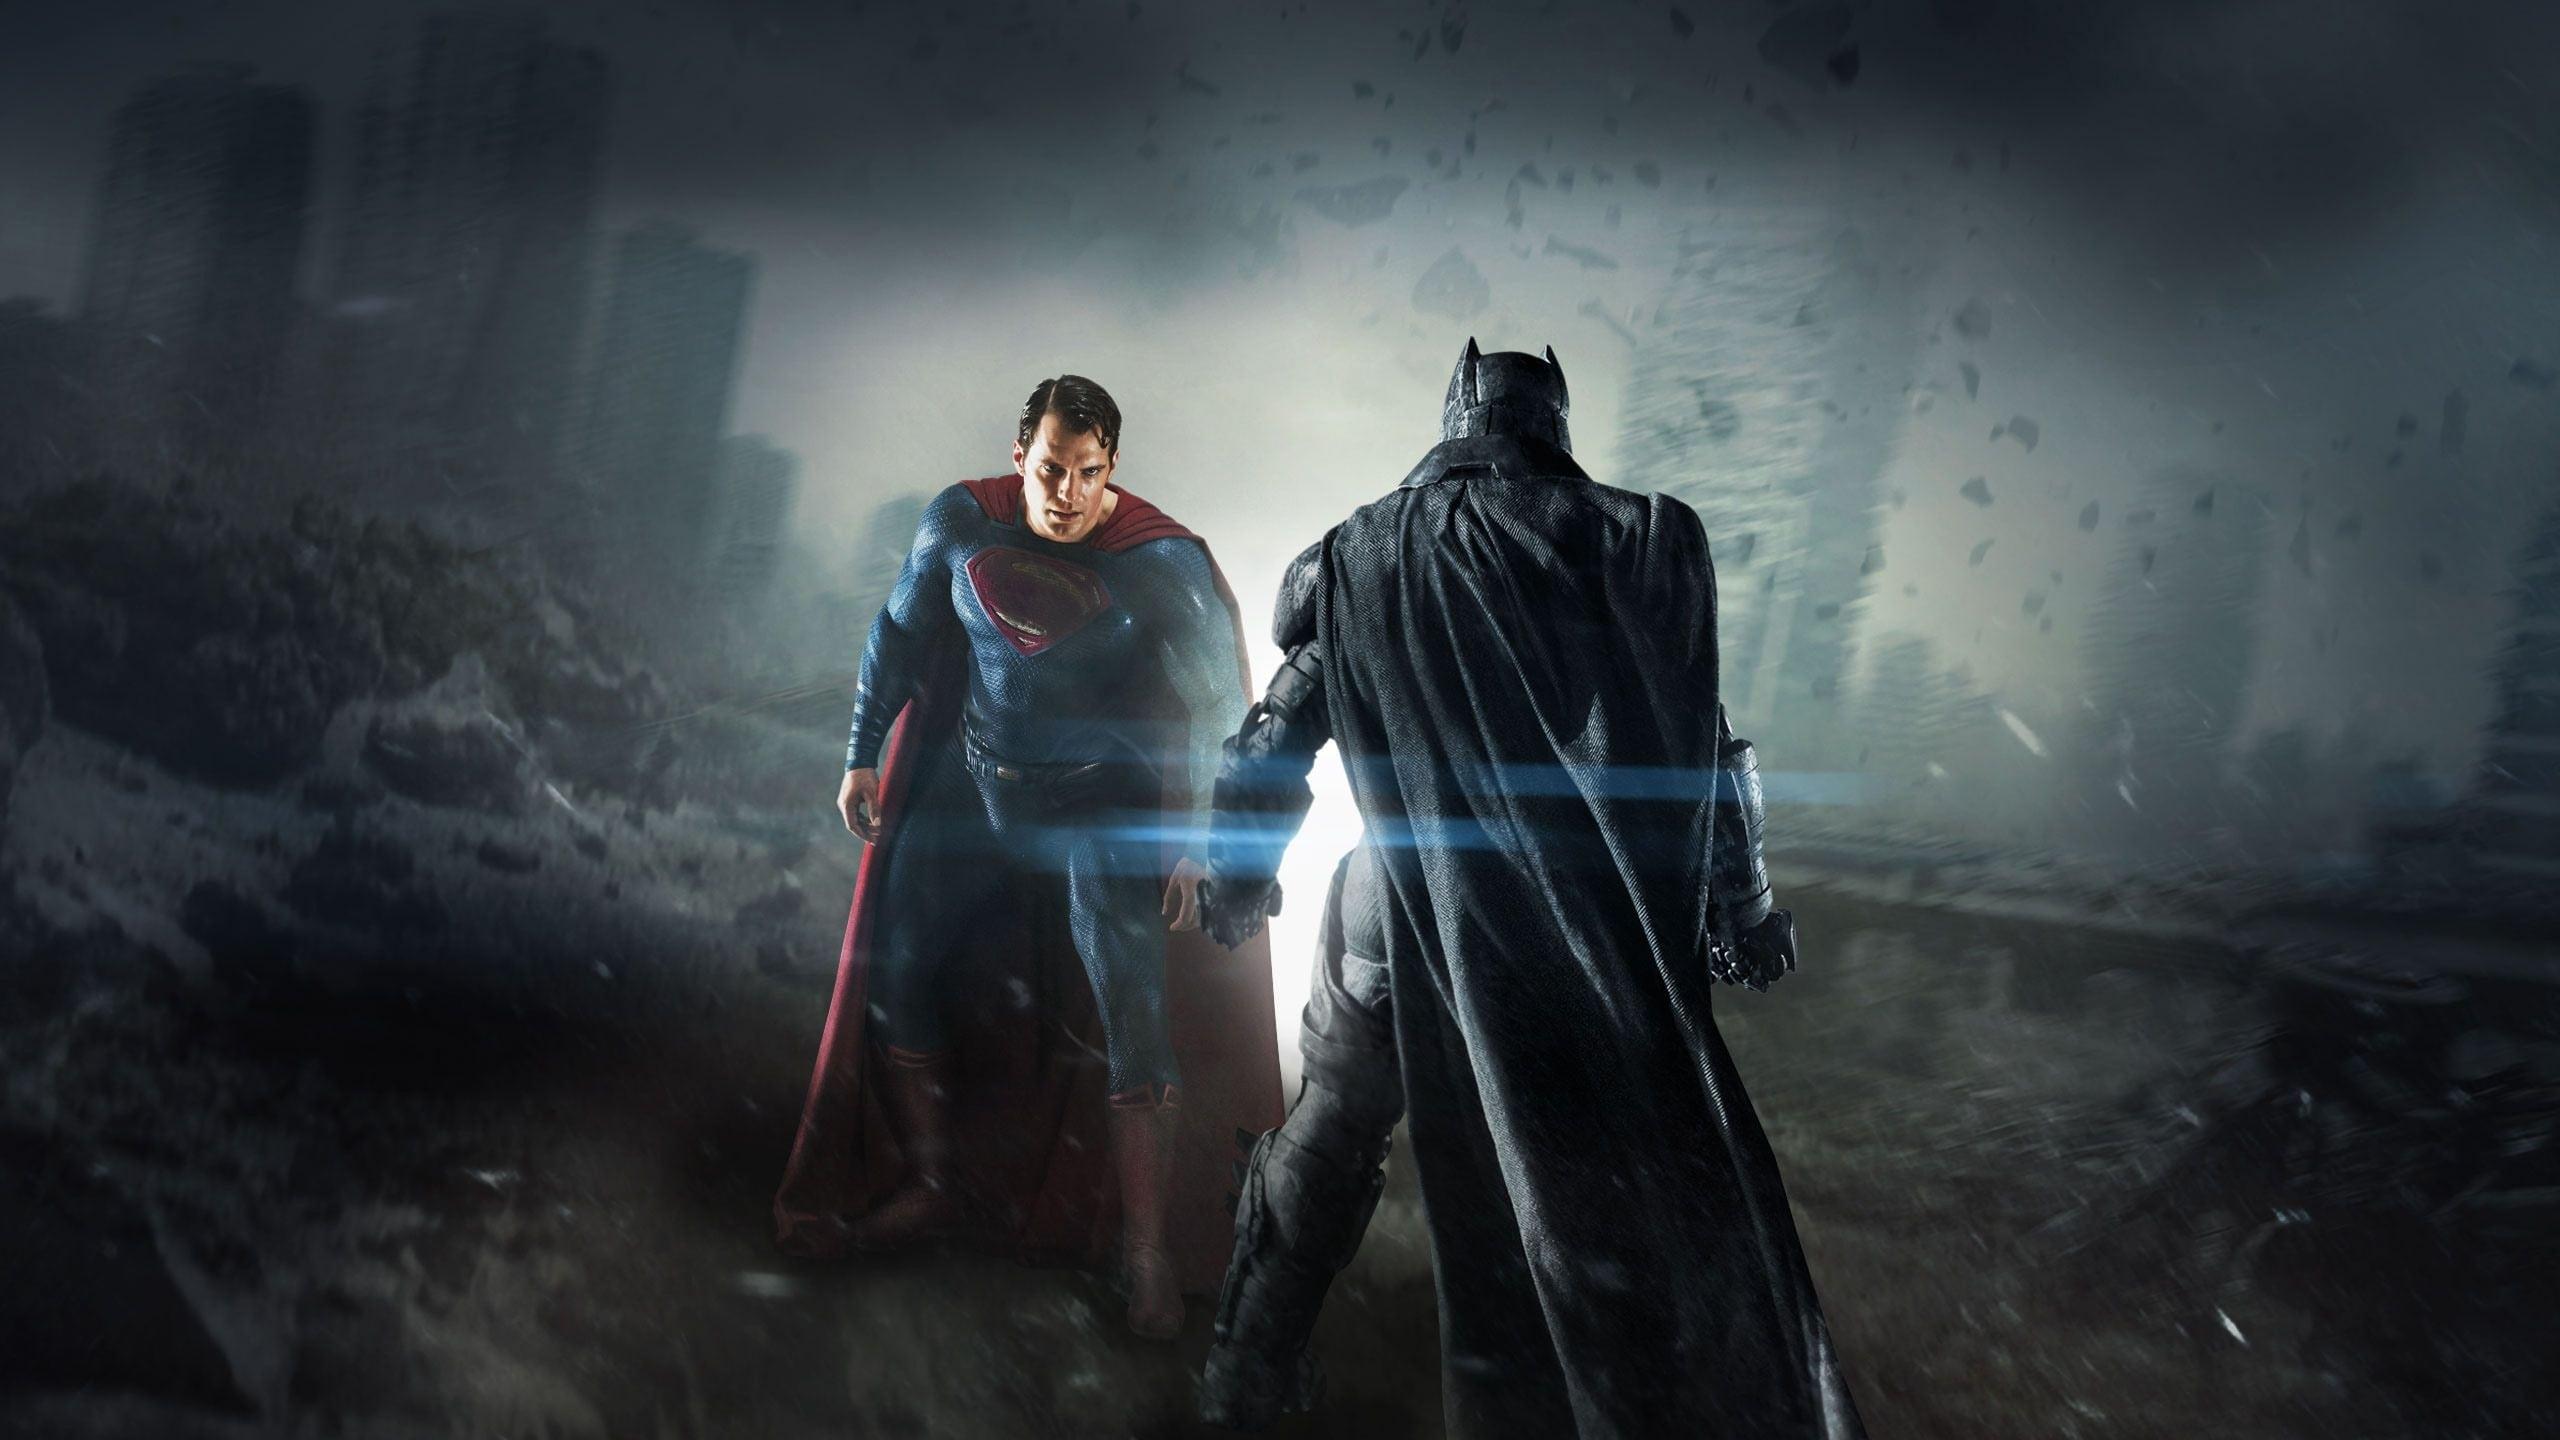 batman vs superman movie4k